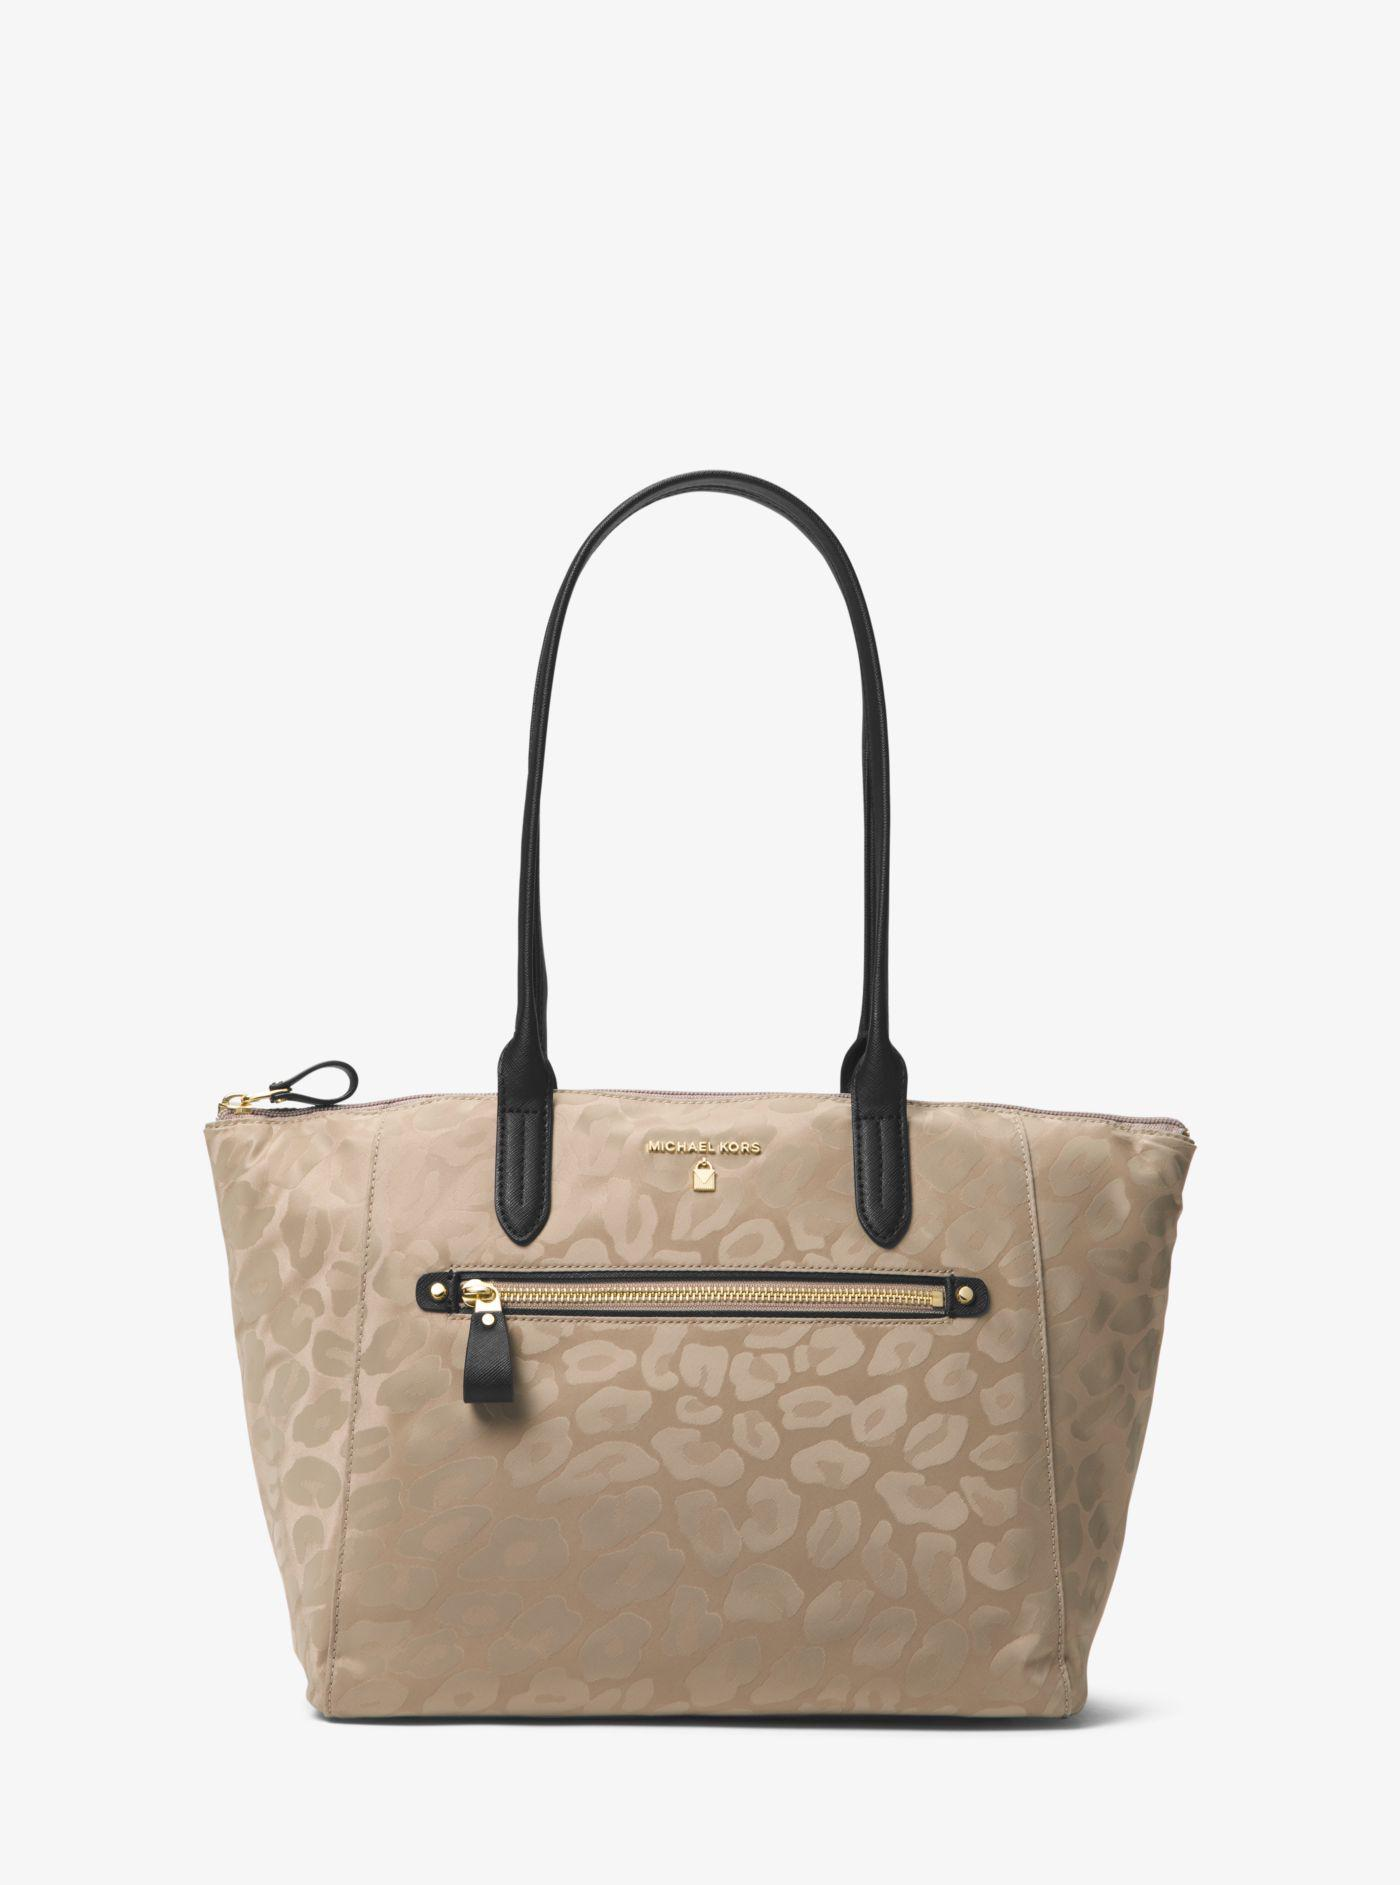 b4a46ace4af8 Michael Kors Nylon Handbags - Foto Handbag All Collections ...